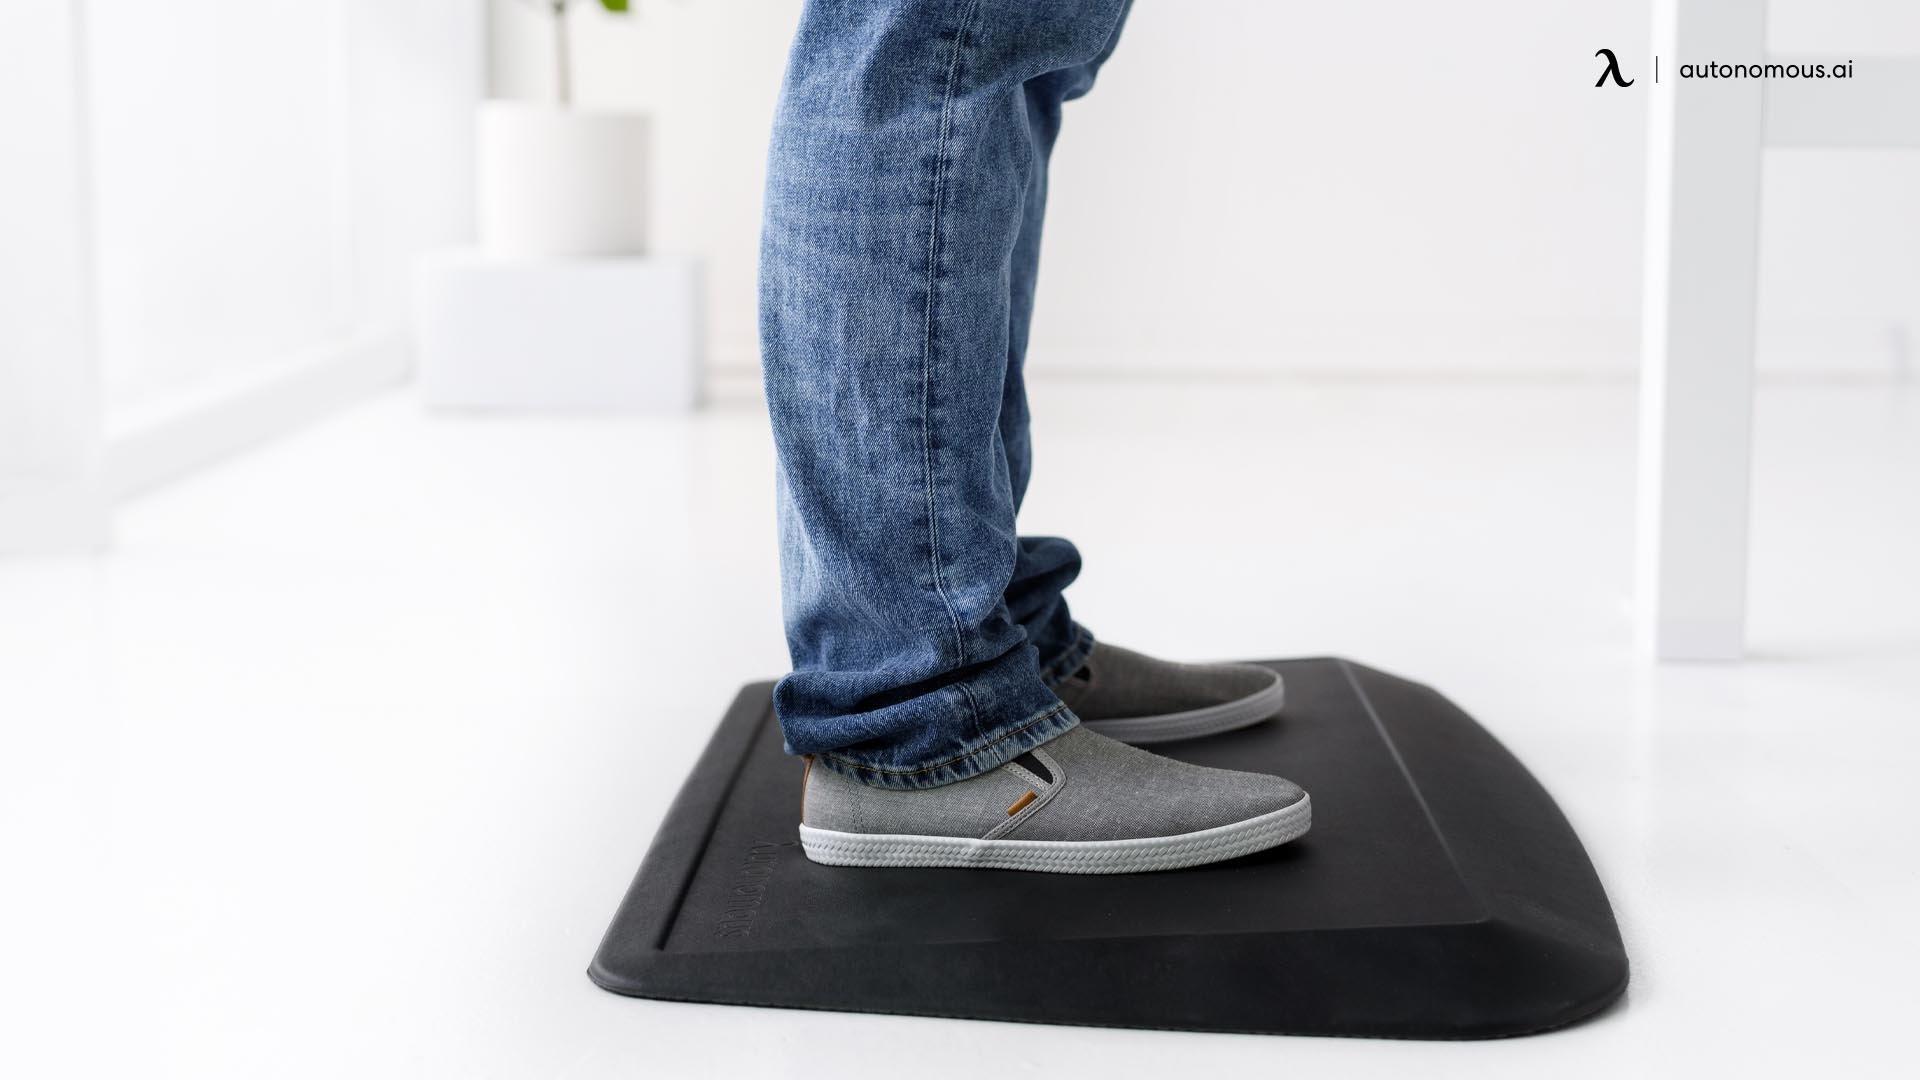 Autonomous Anti-Fatigue mat